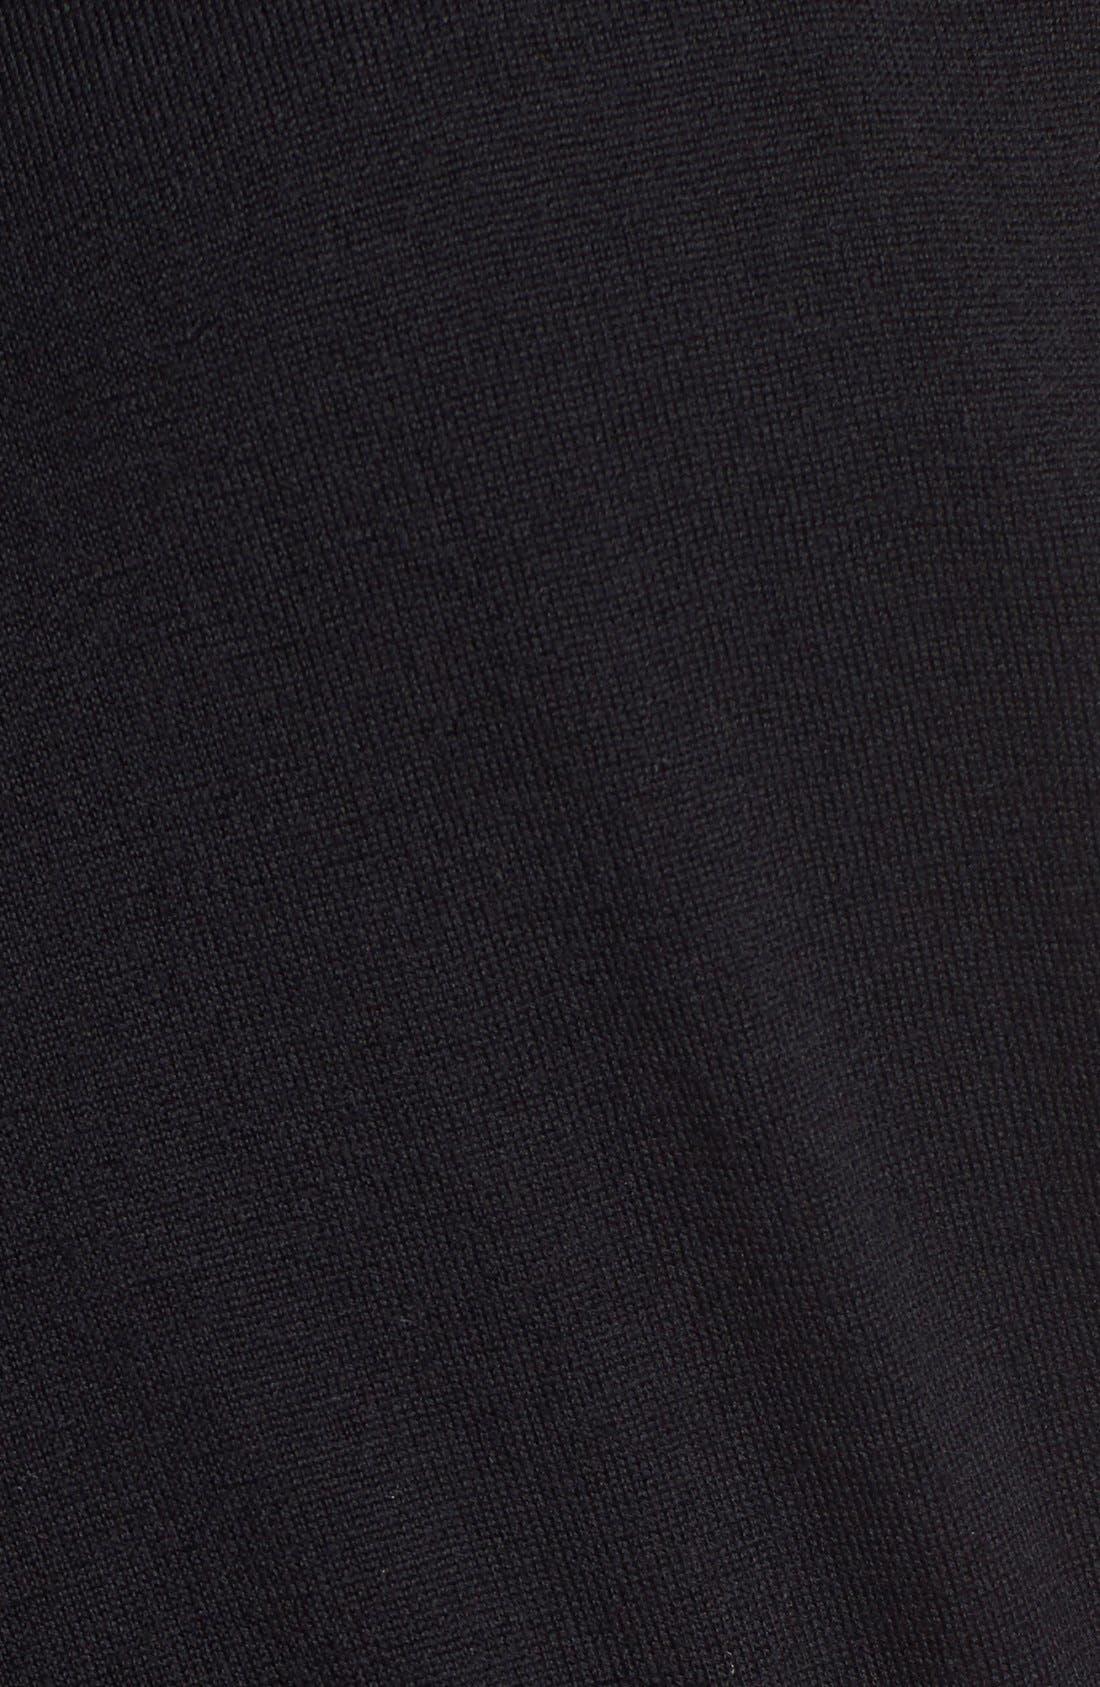 Regular Fit Crewneck Sweater,                             Alternate thumbnail 5, color,                             001